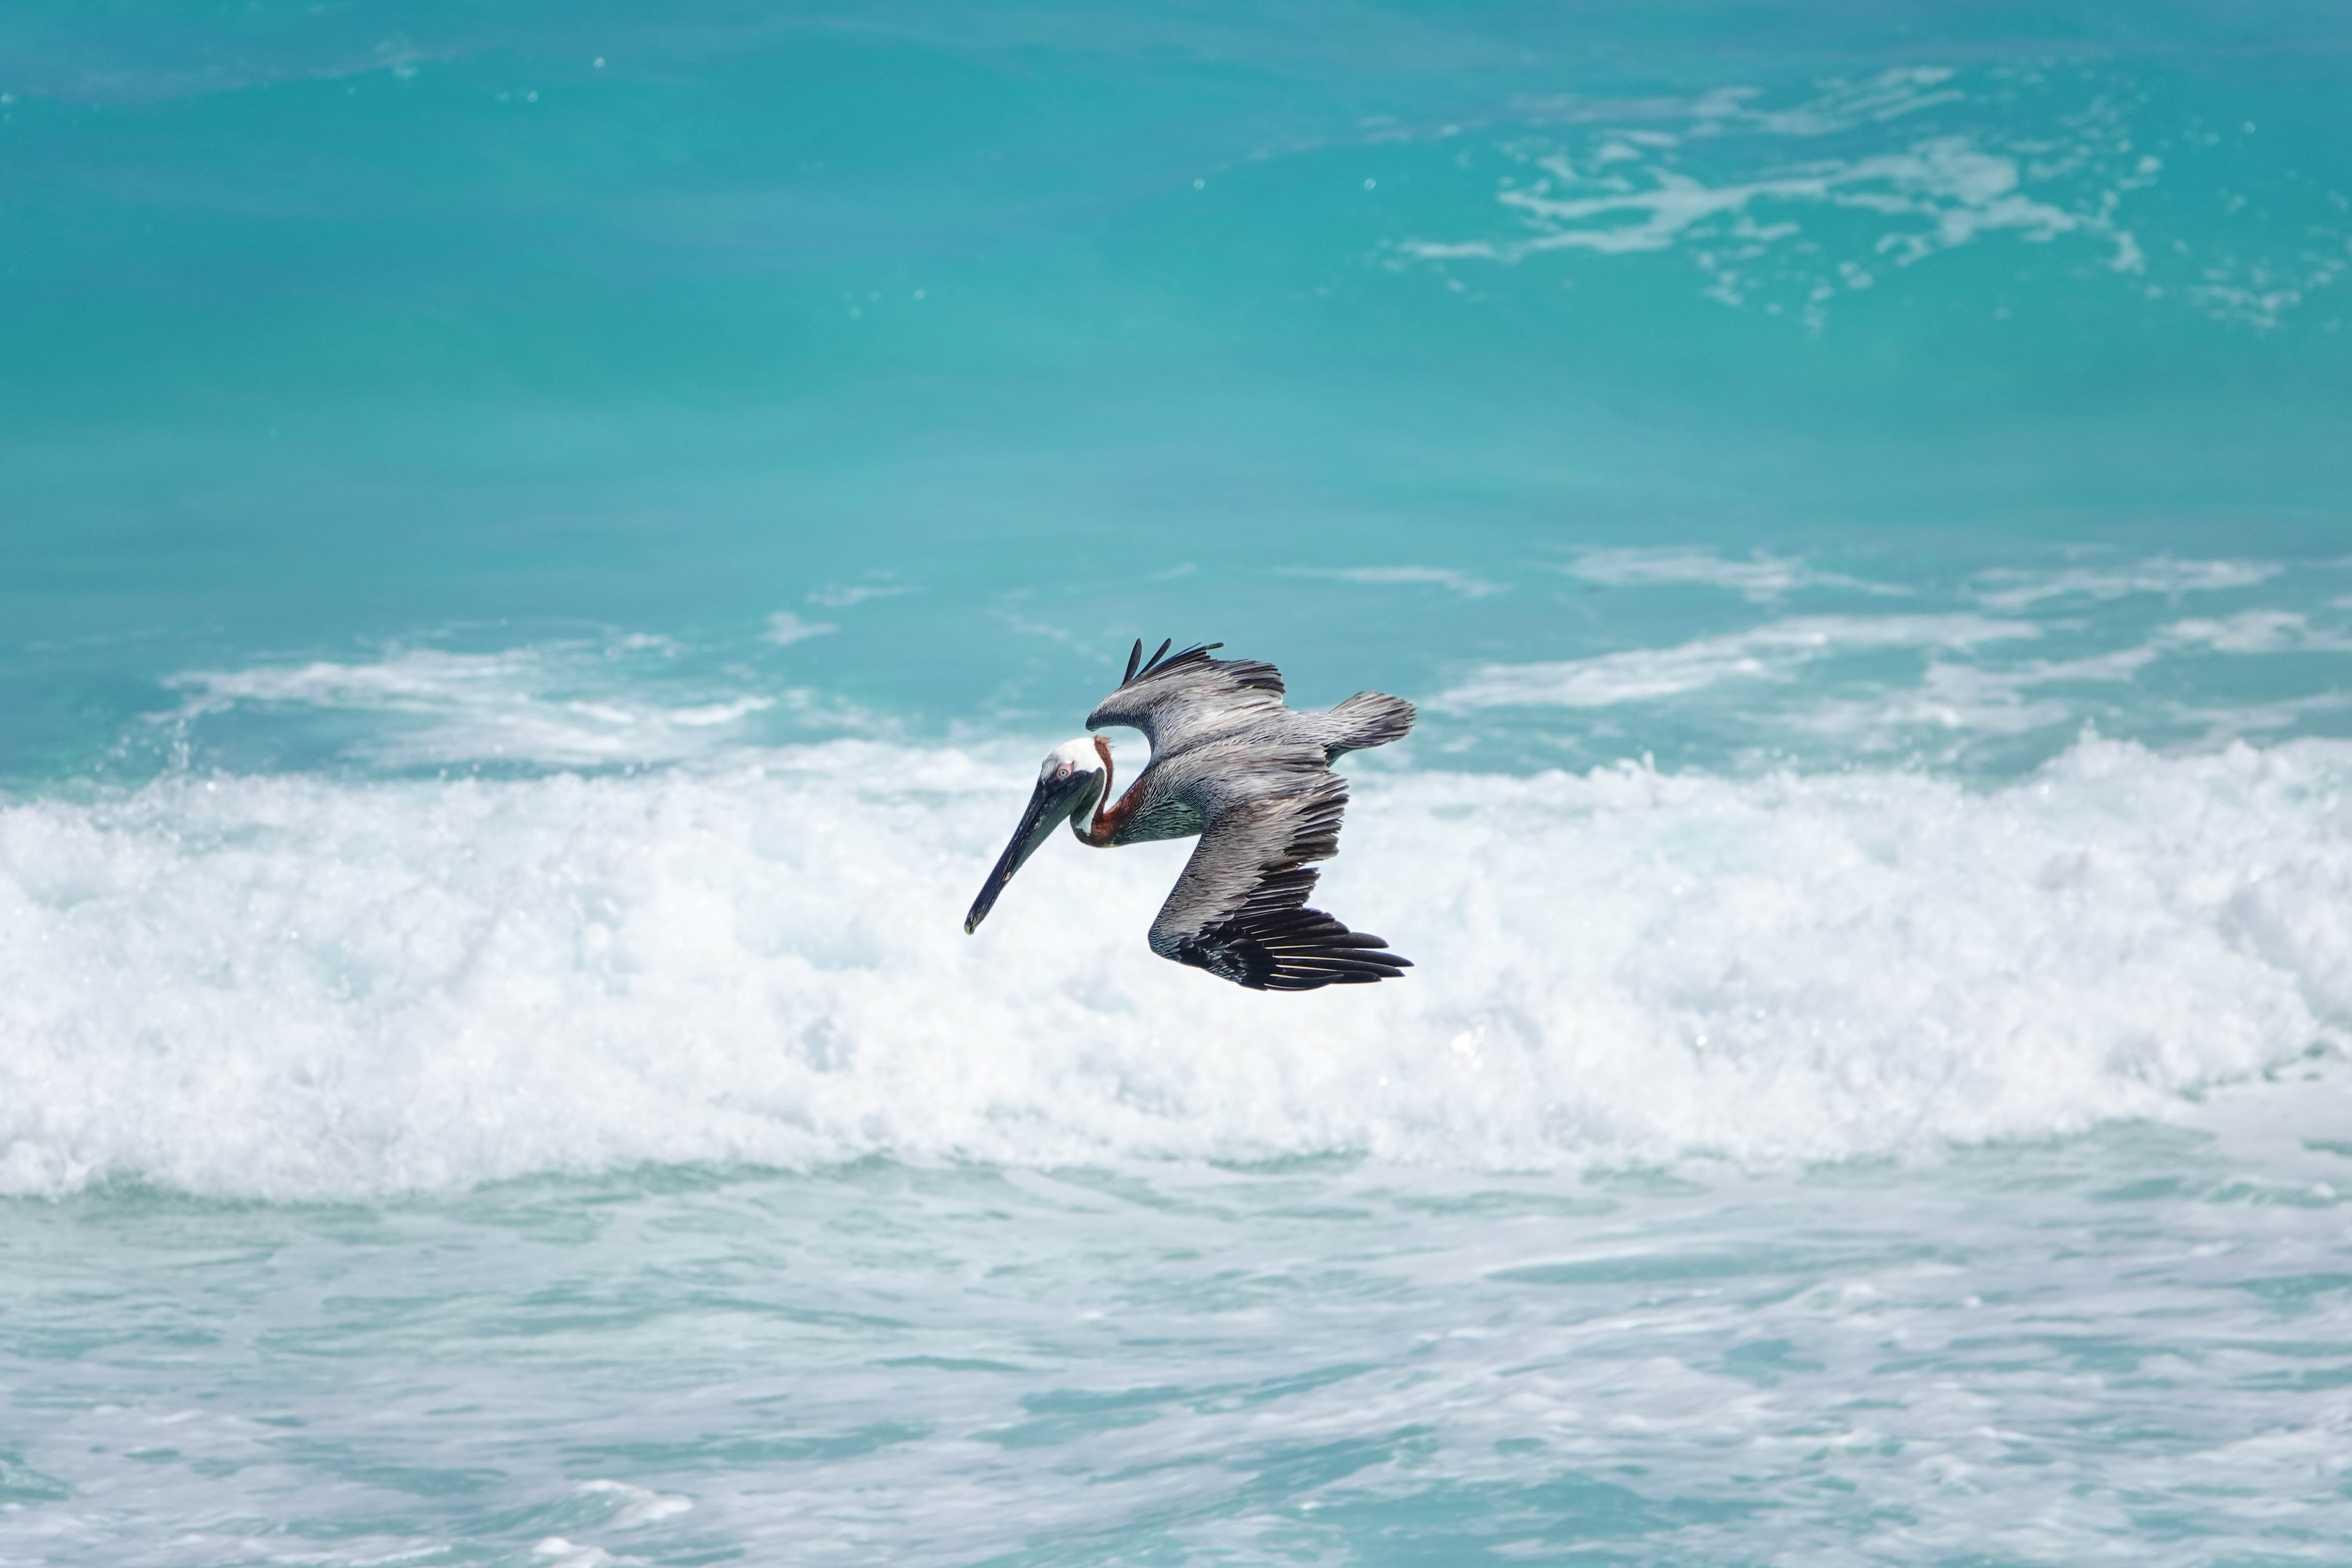 Pelicano in flight2.jpg